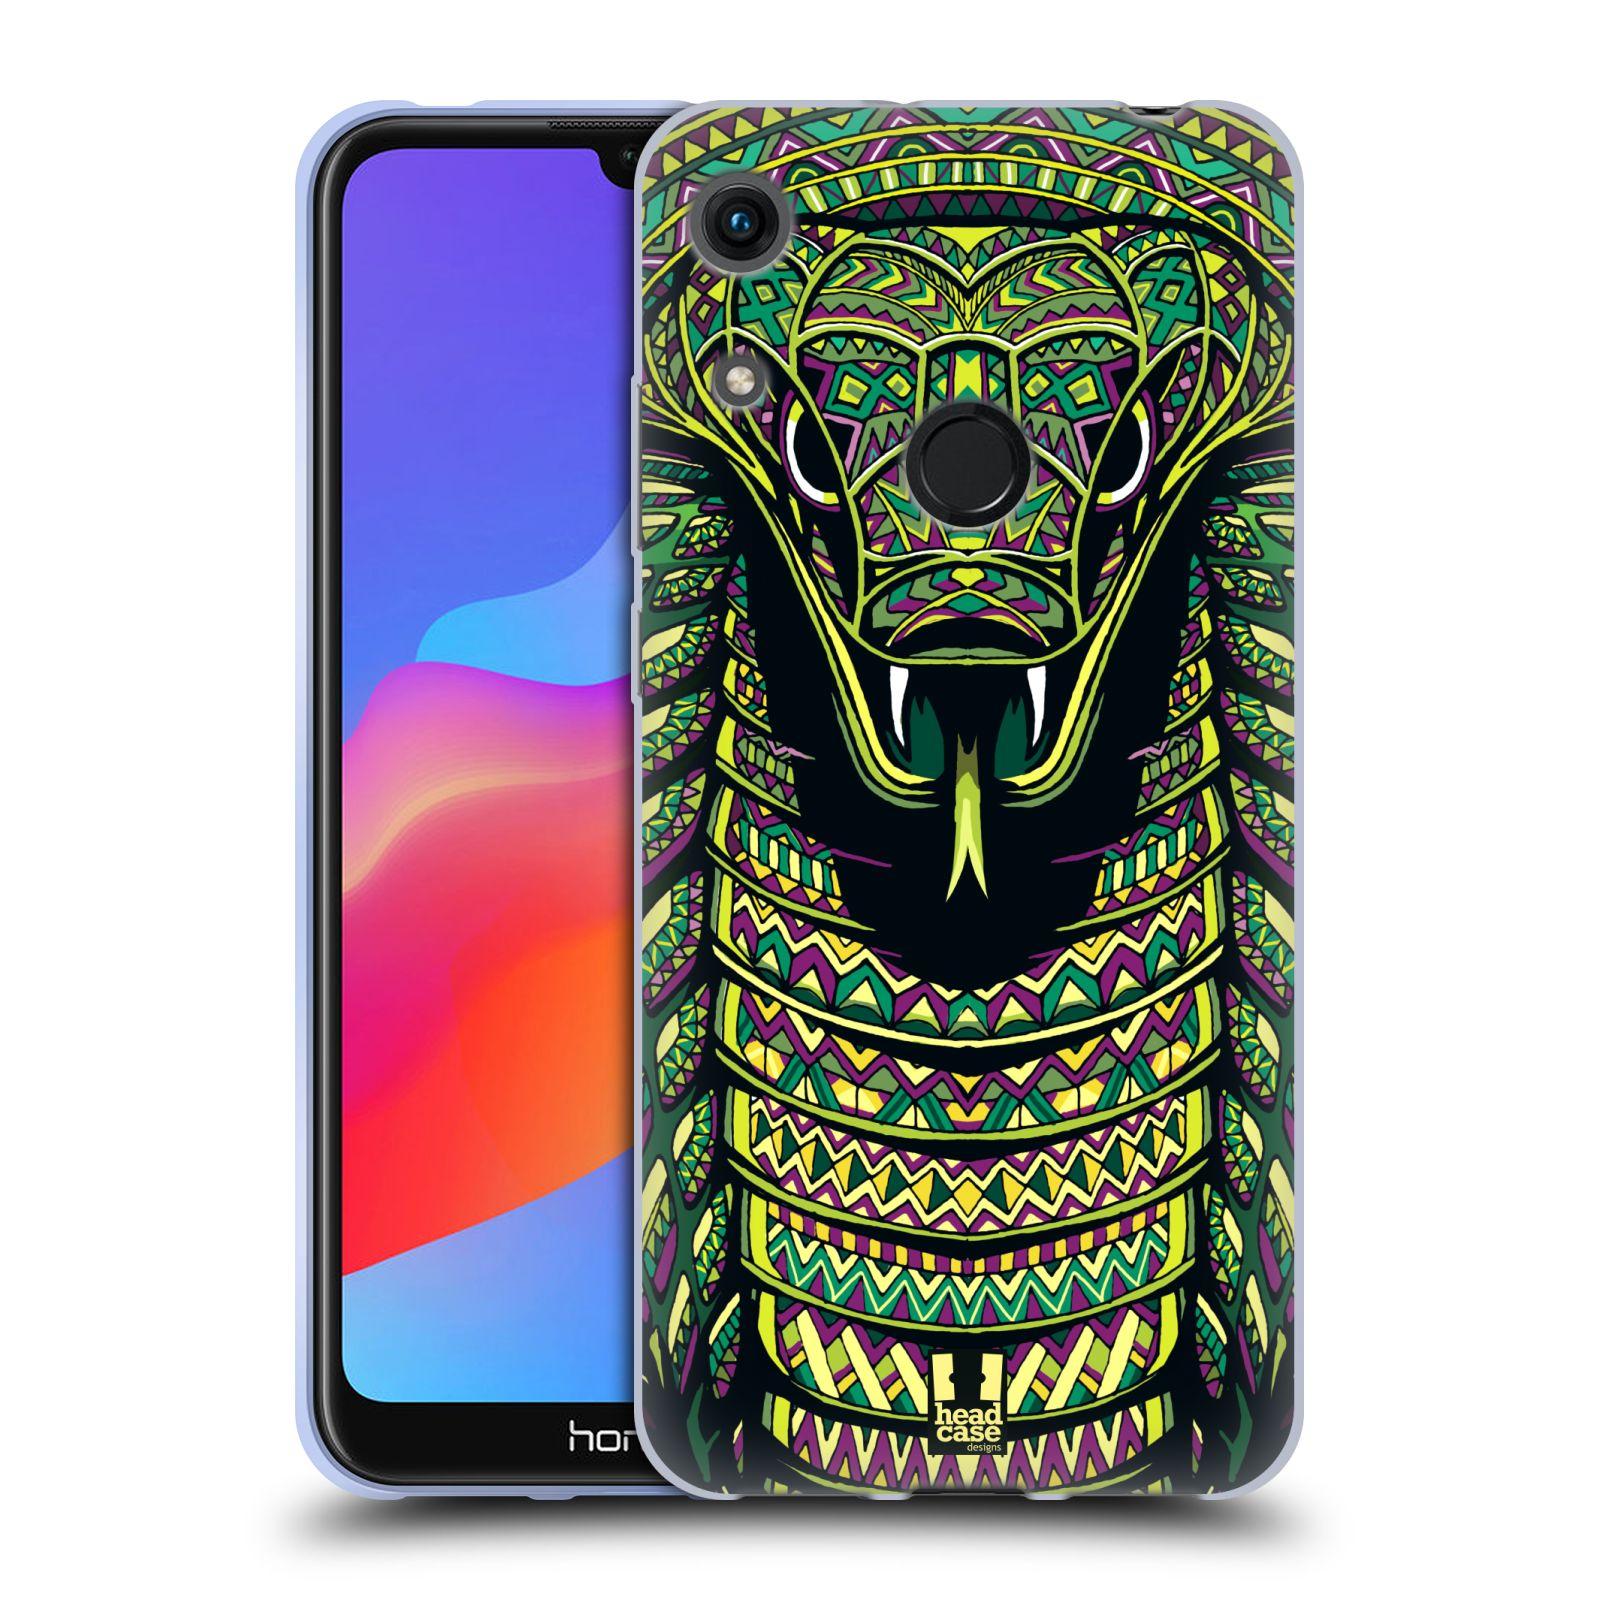 Silikonové pouzdro na mobil Honor 8A - Head Case - AZTEC HAD